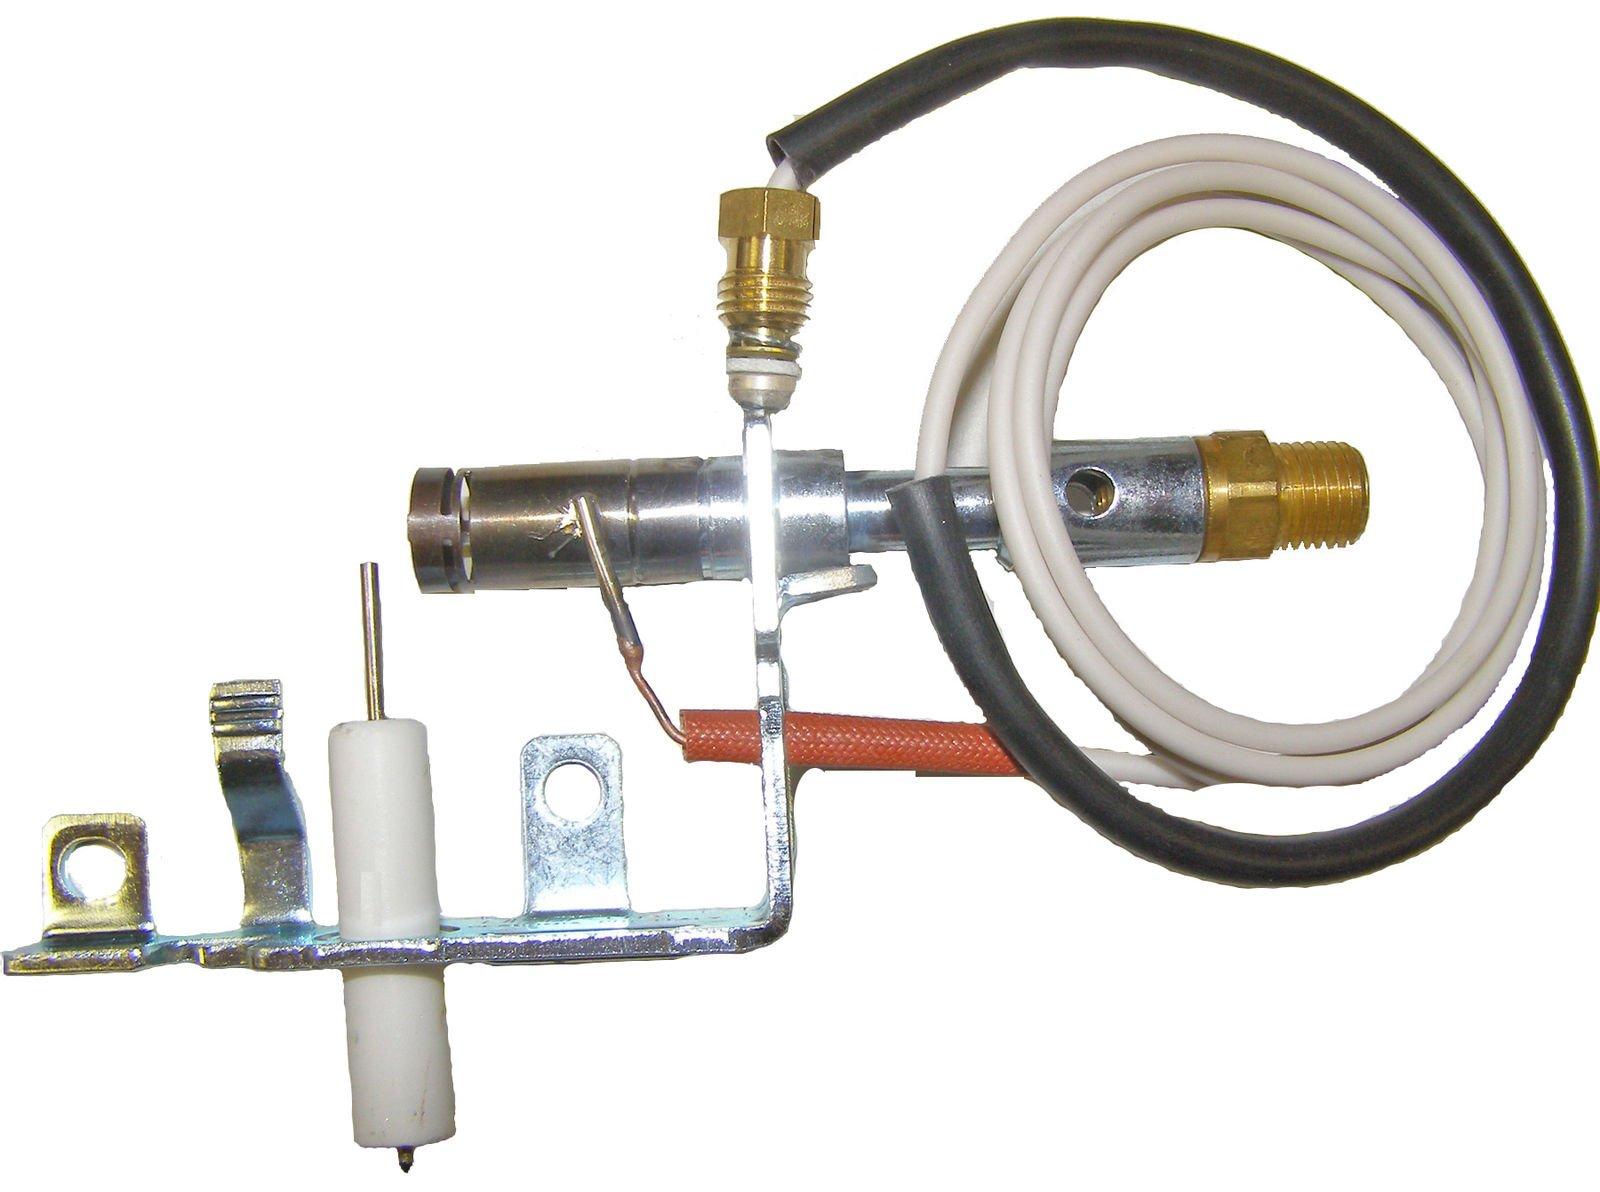 superlin Propane Heater Replace F270399, 70358 Pilot ODS Assembly Mr Heater Heatstar LPG